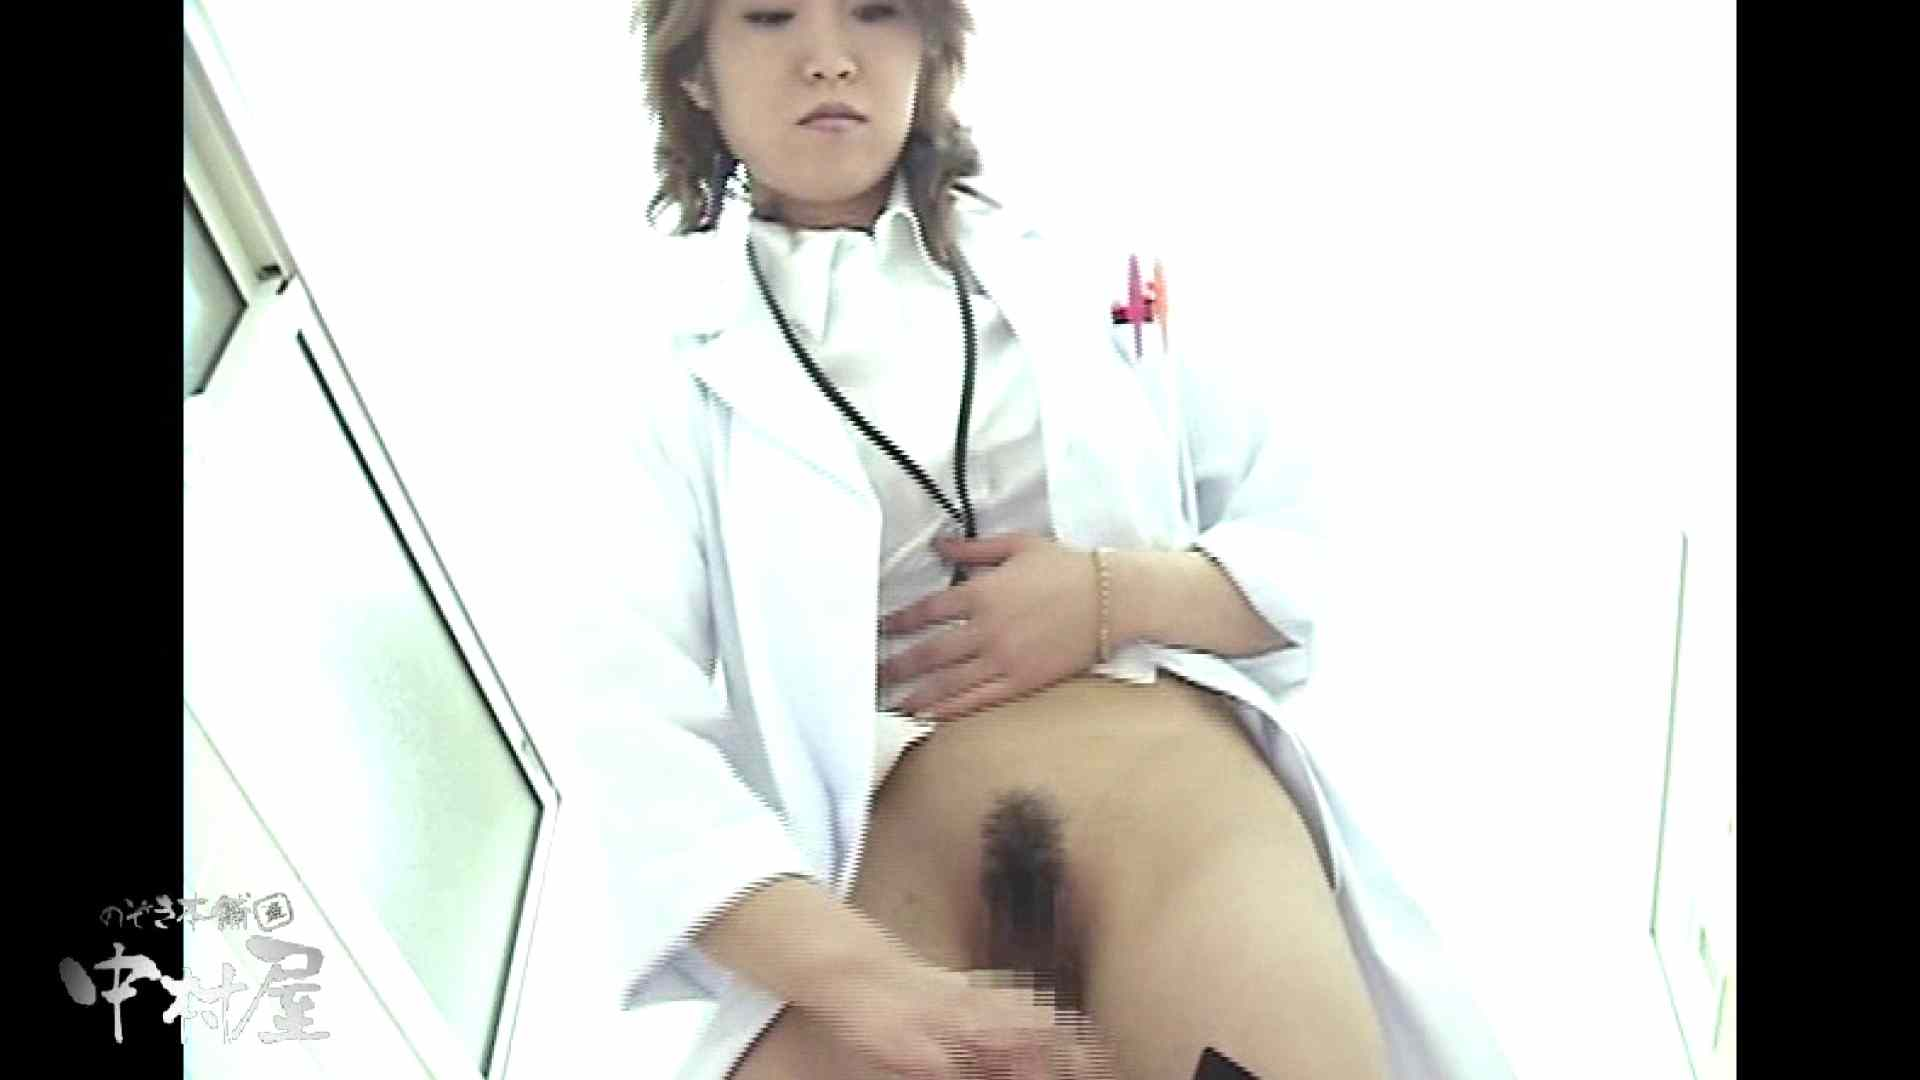 都内某大学病院編 和式イ更所盗撮 その⑮ 5名 女医丸裸 | 放尿  72pic 1